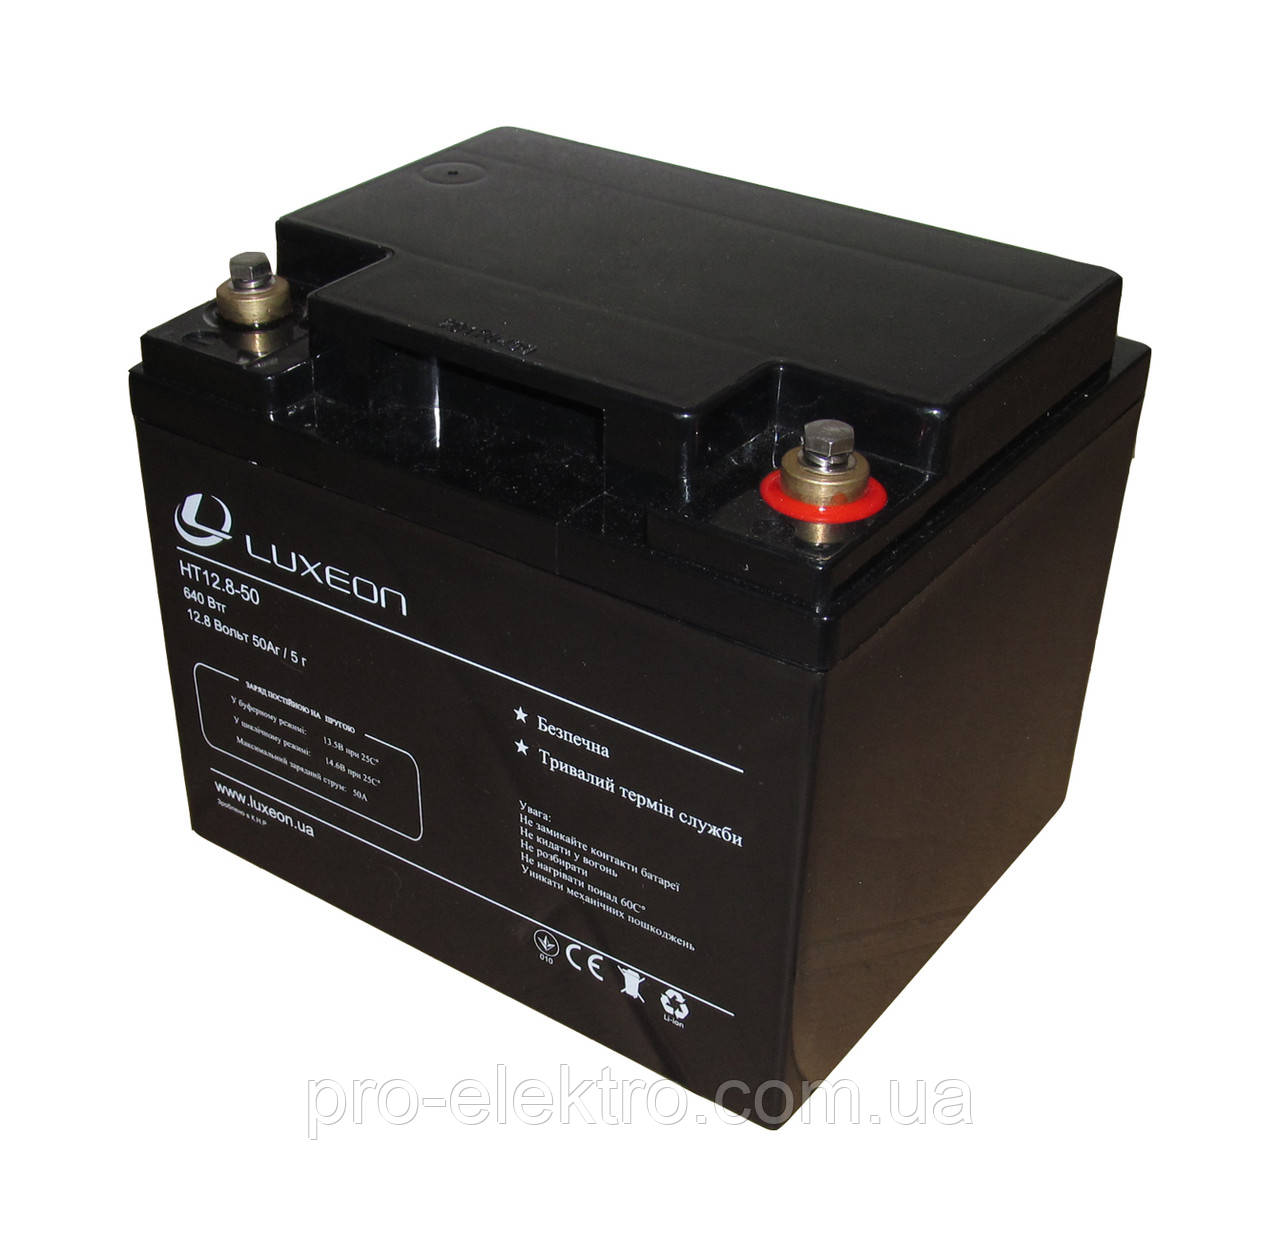 Аккумуляторная батарея LUXEON HT12.8-50